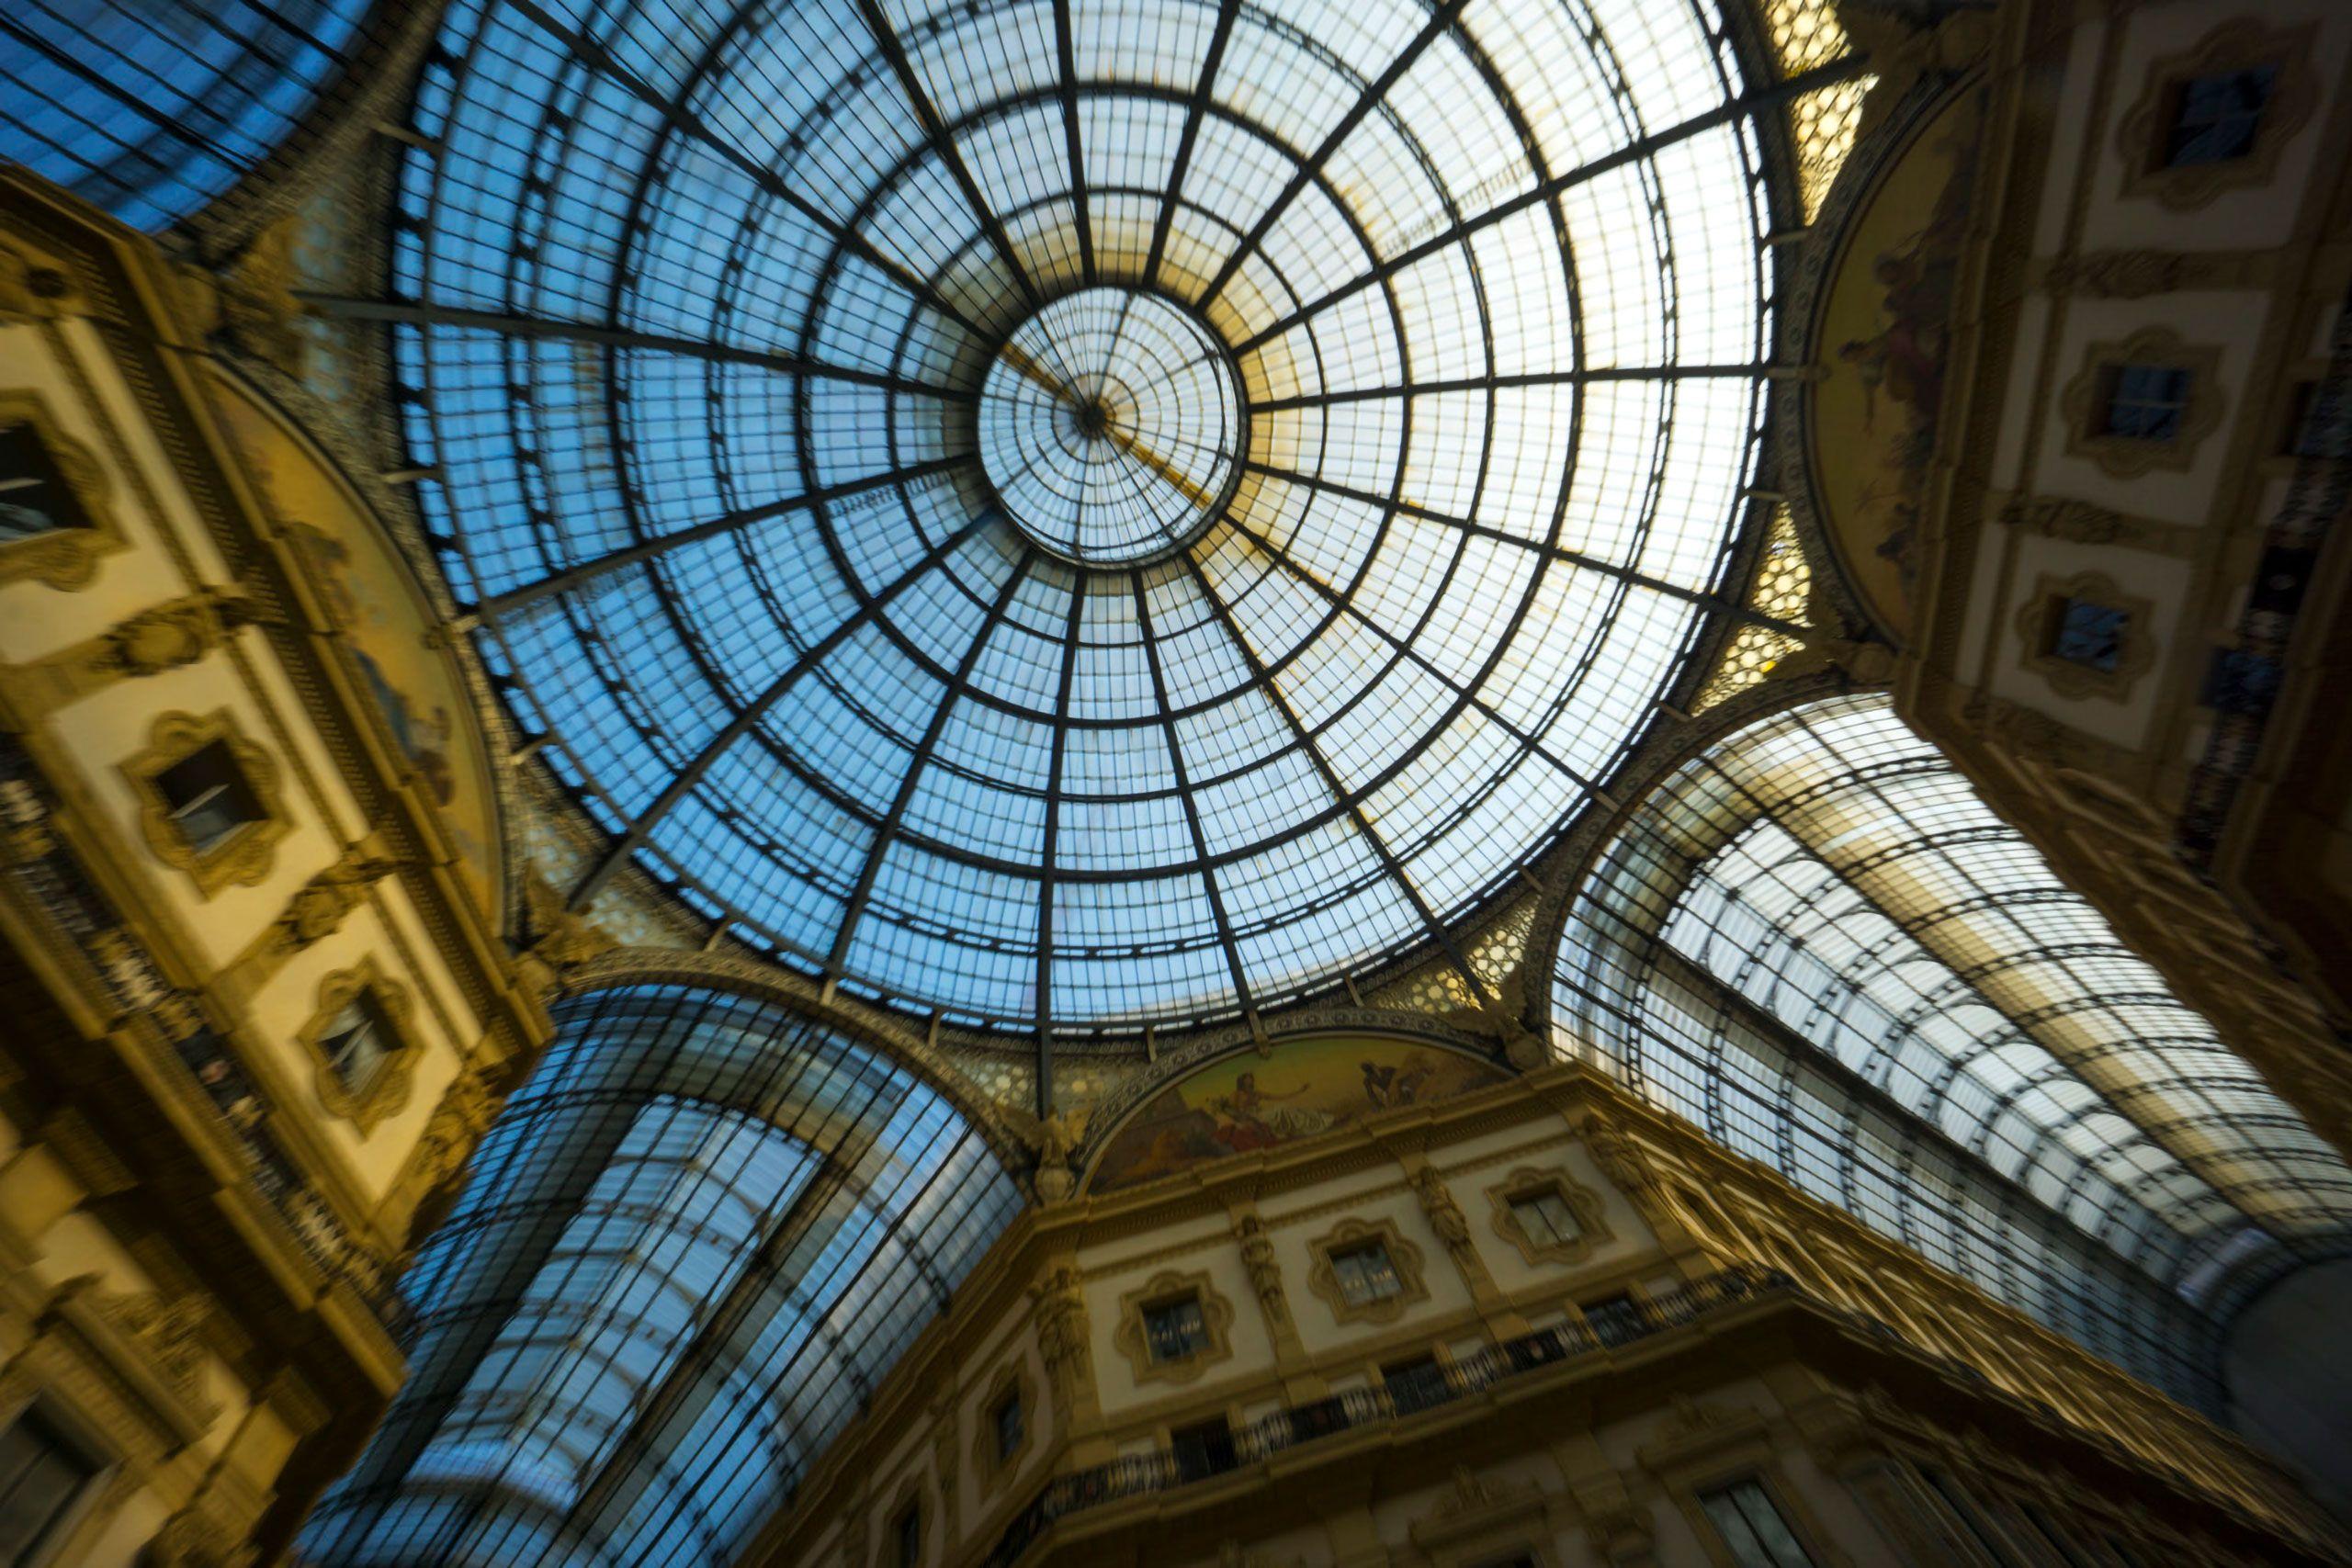 Milan arcade roof  Galleria Vittorio Emanuele II Piazza del Duomo